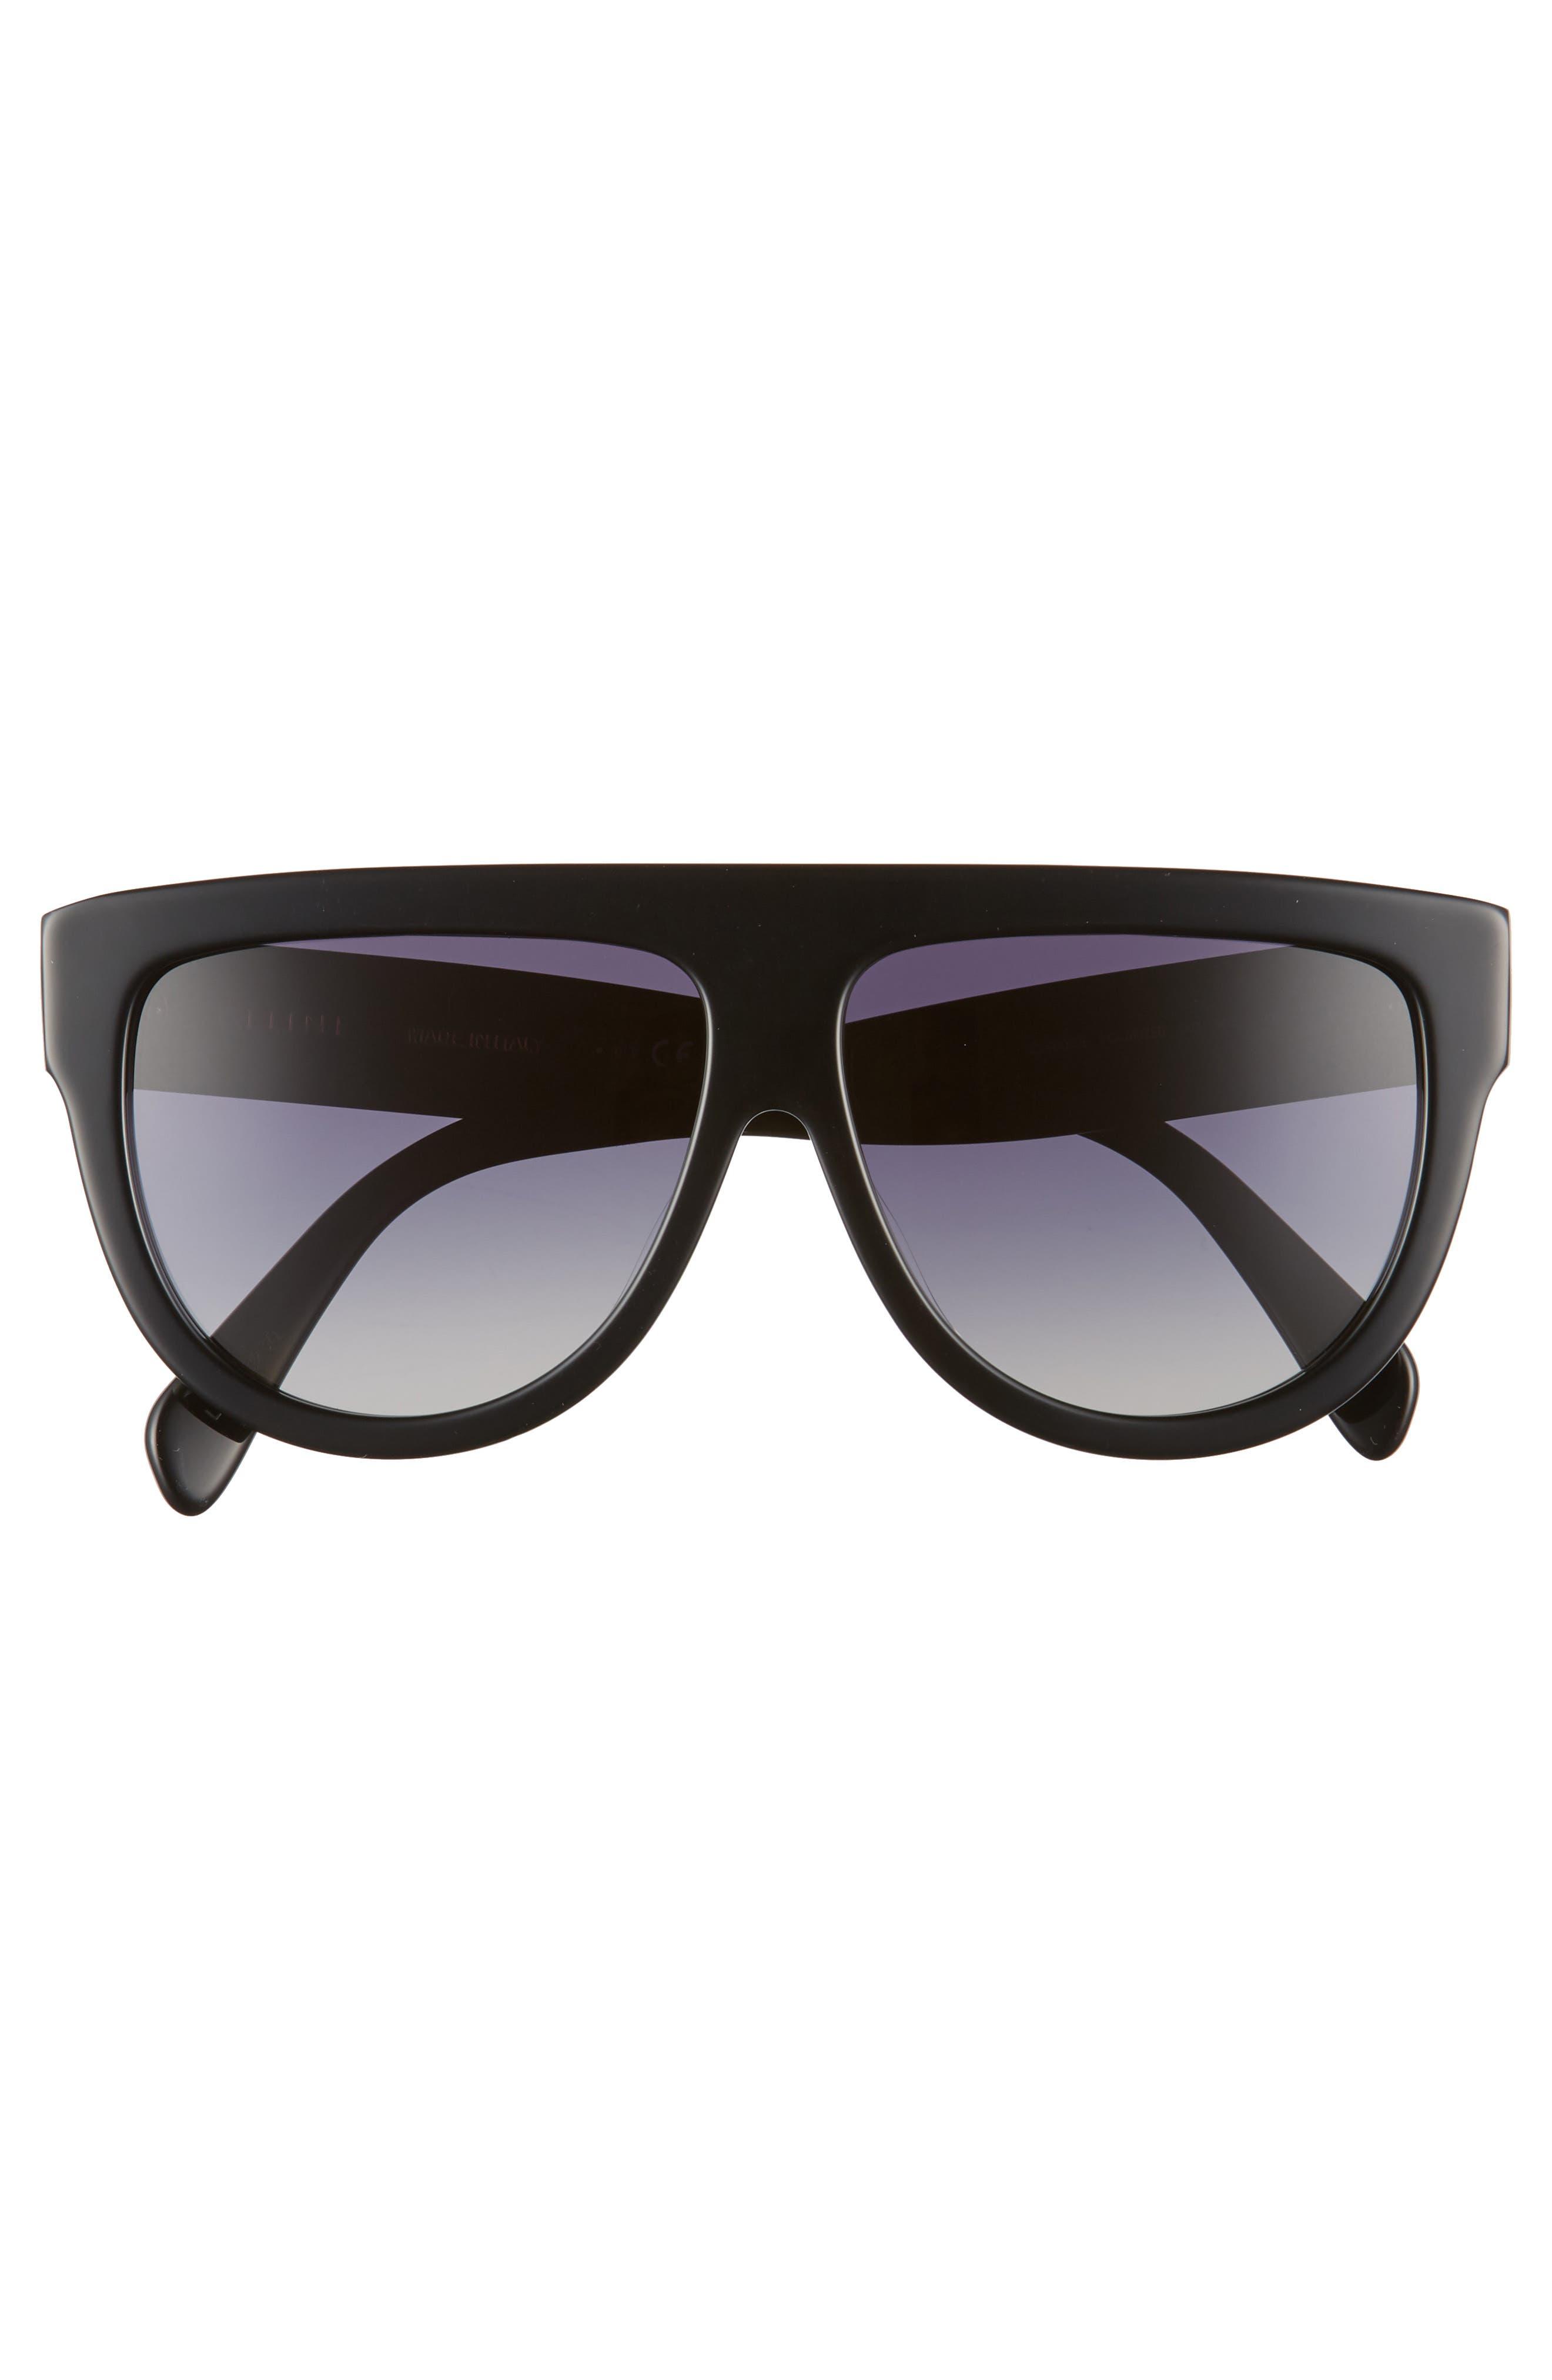 Special Fit 60mm Polarized Gradient Flat Top Sunglasses,                             Alternate thumbnail 4, color,                             BLACK/ GRADIENT SMOKE